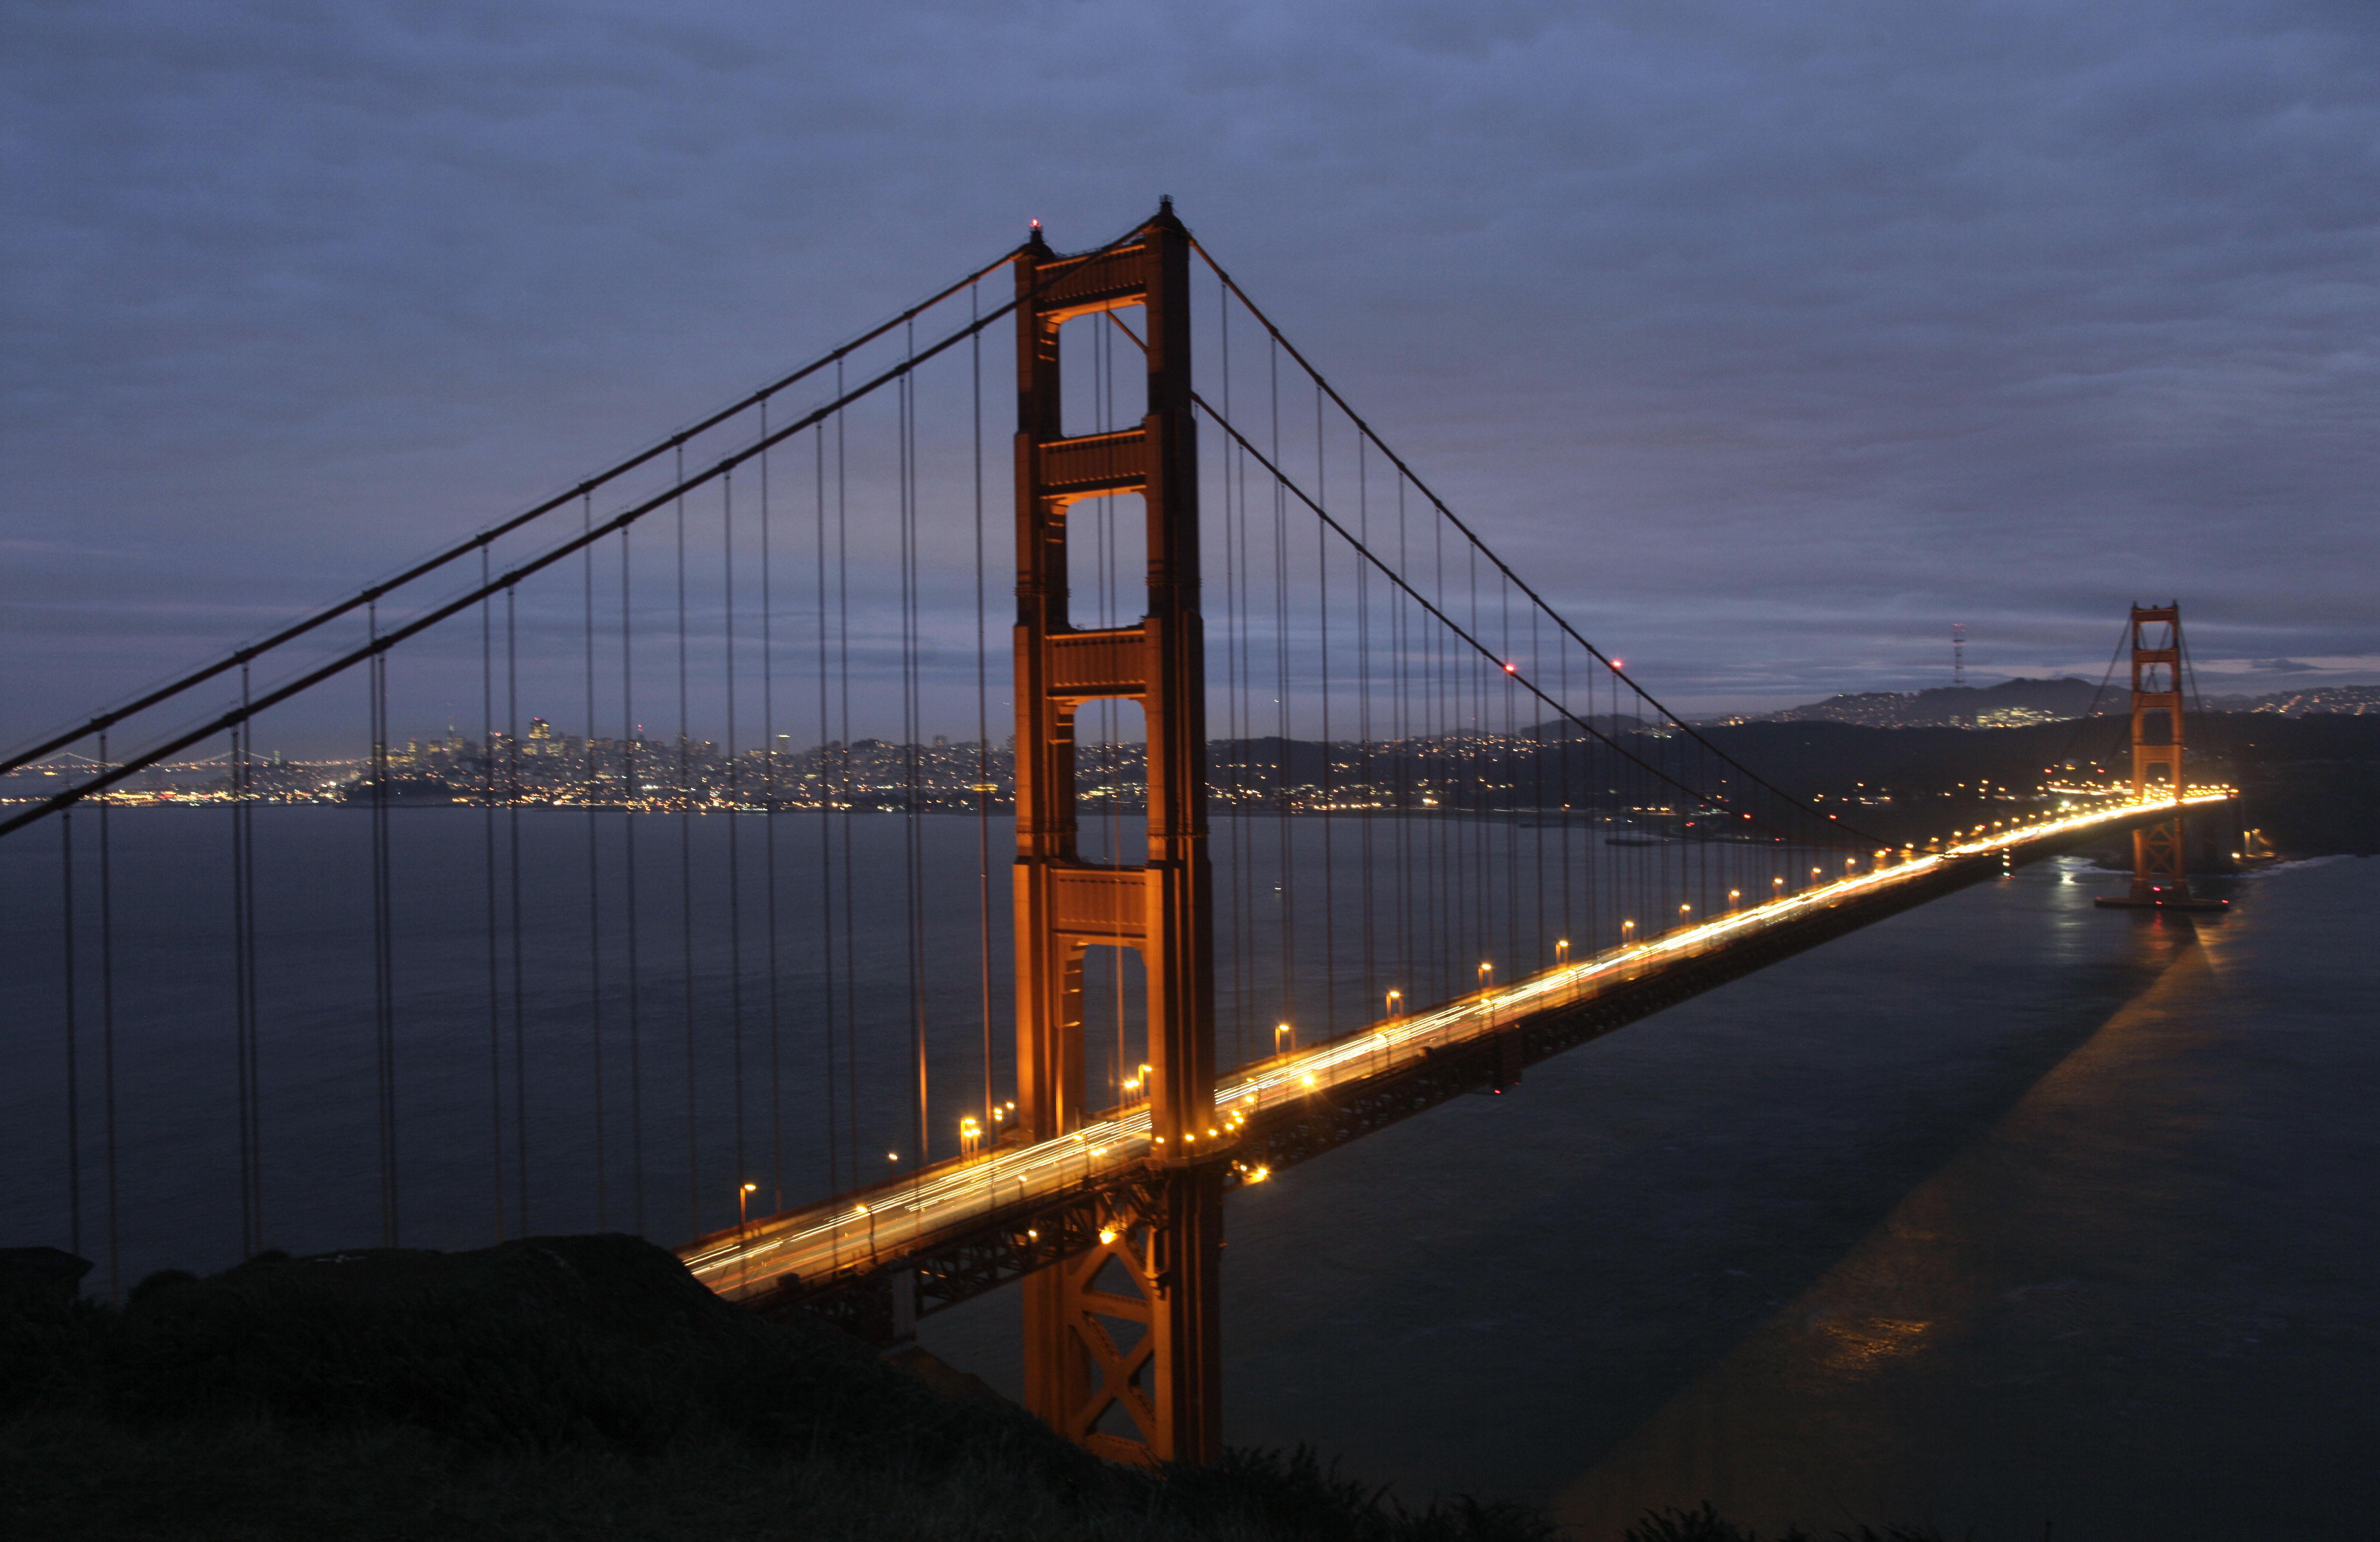 Golden Gate 75th